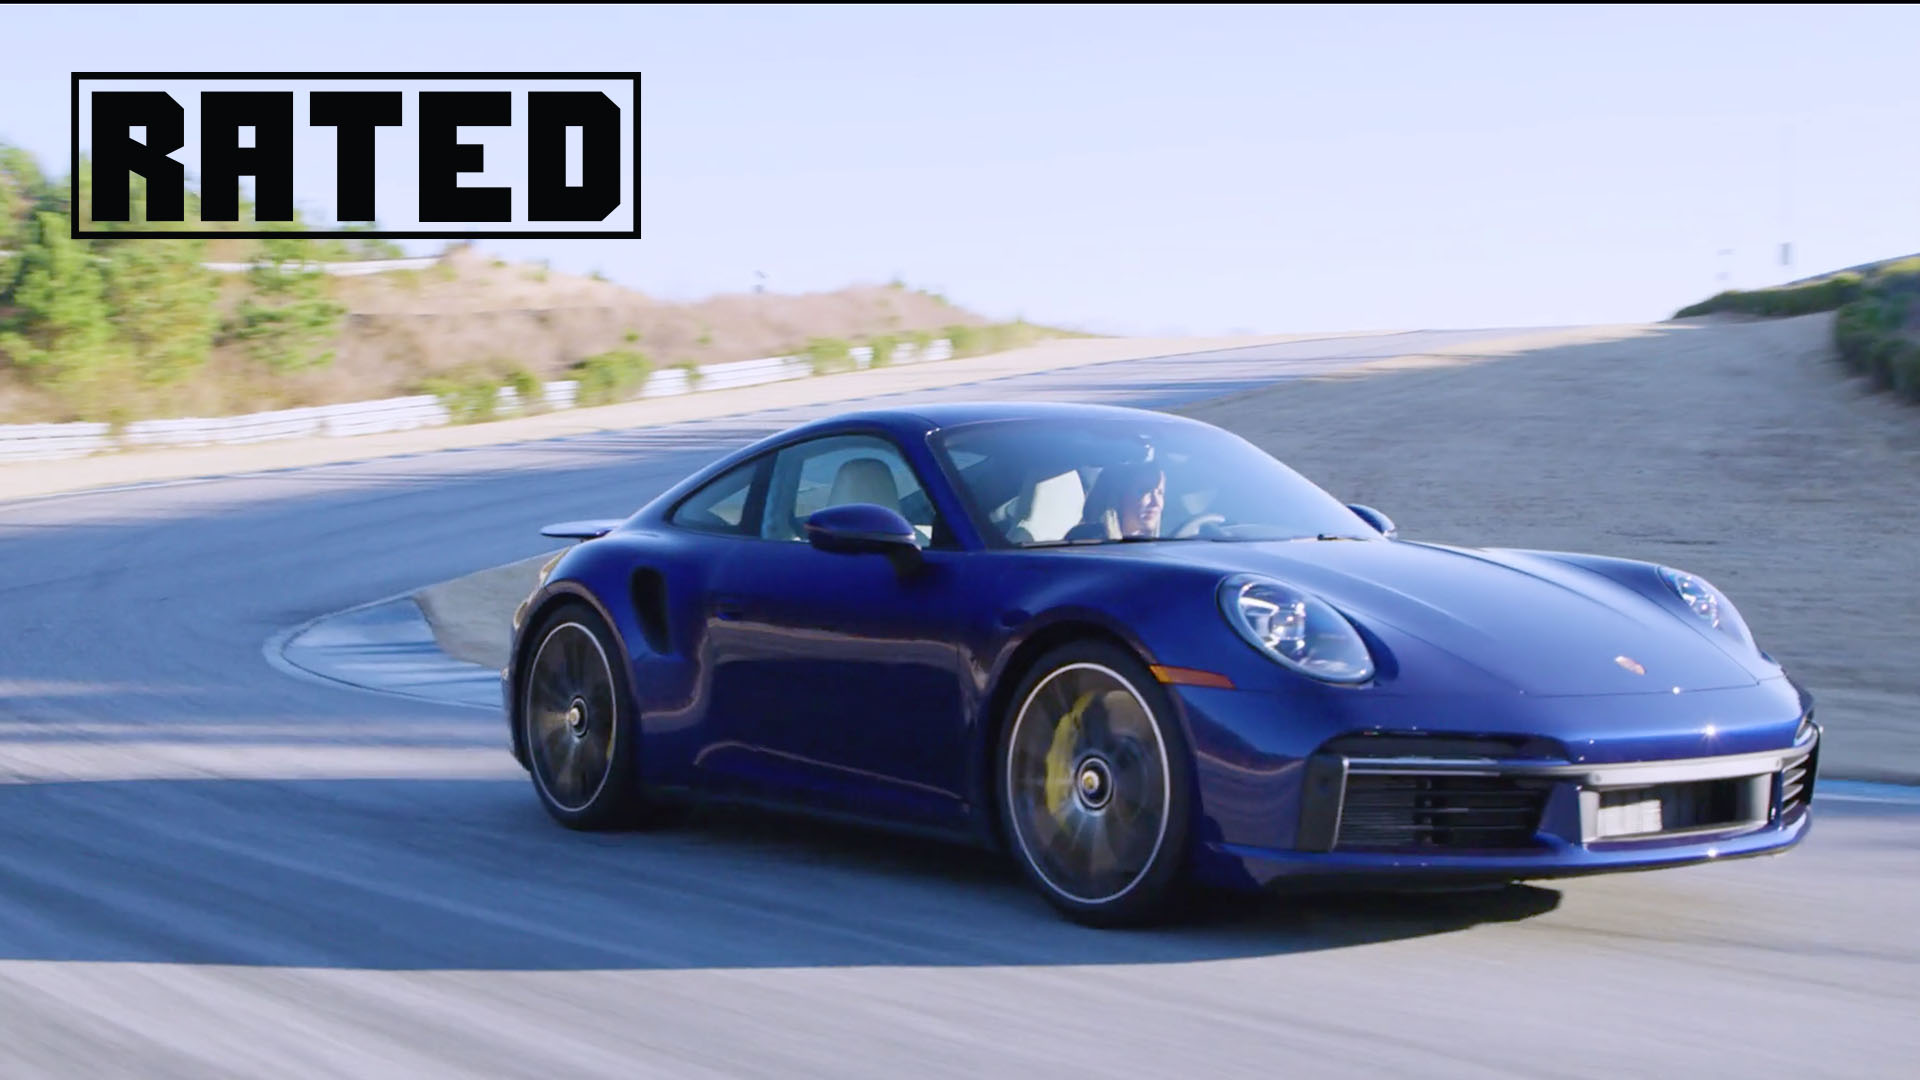 Rated Porsche 911